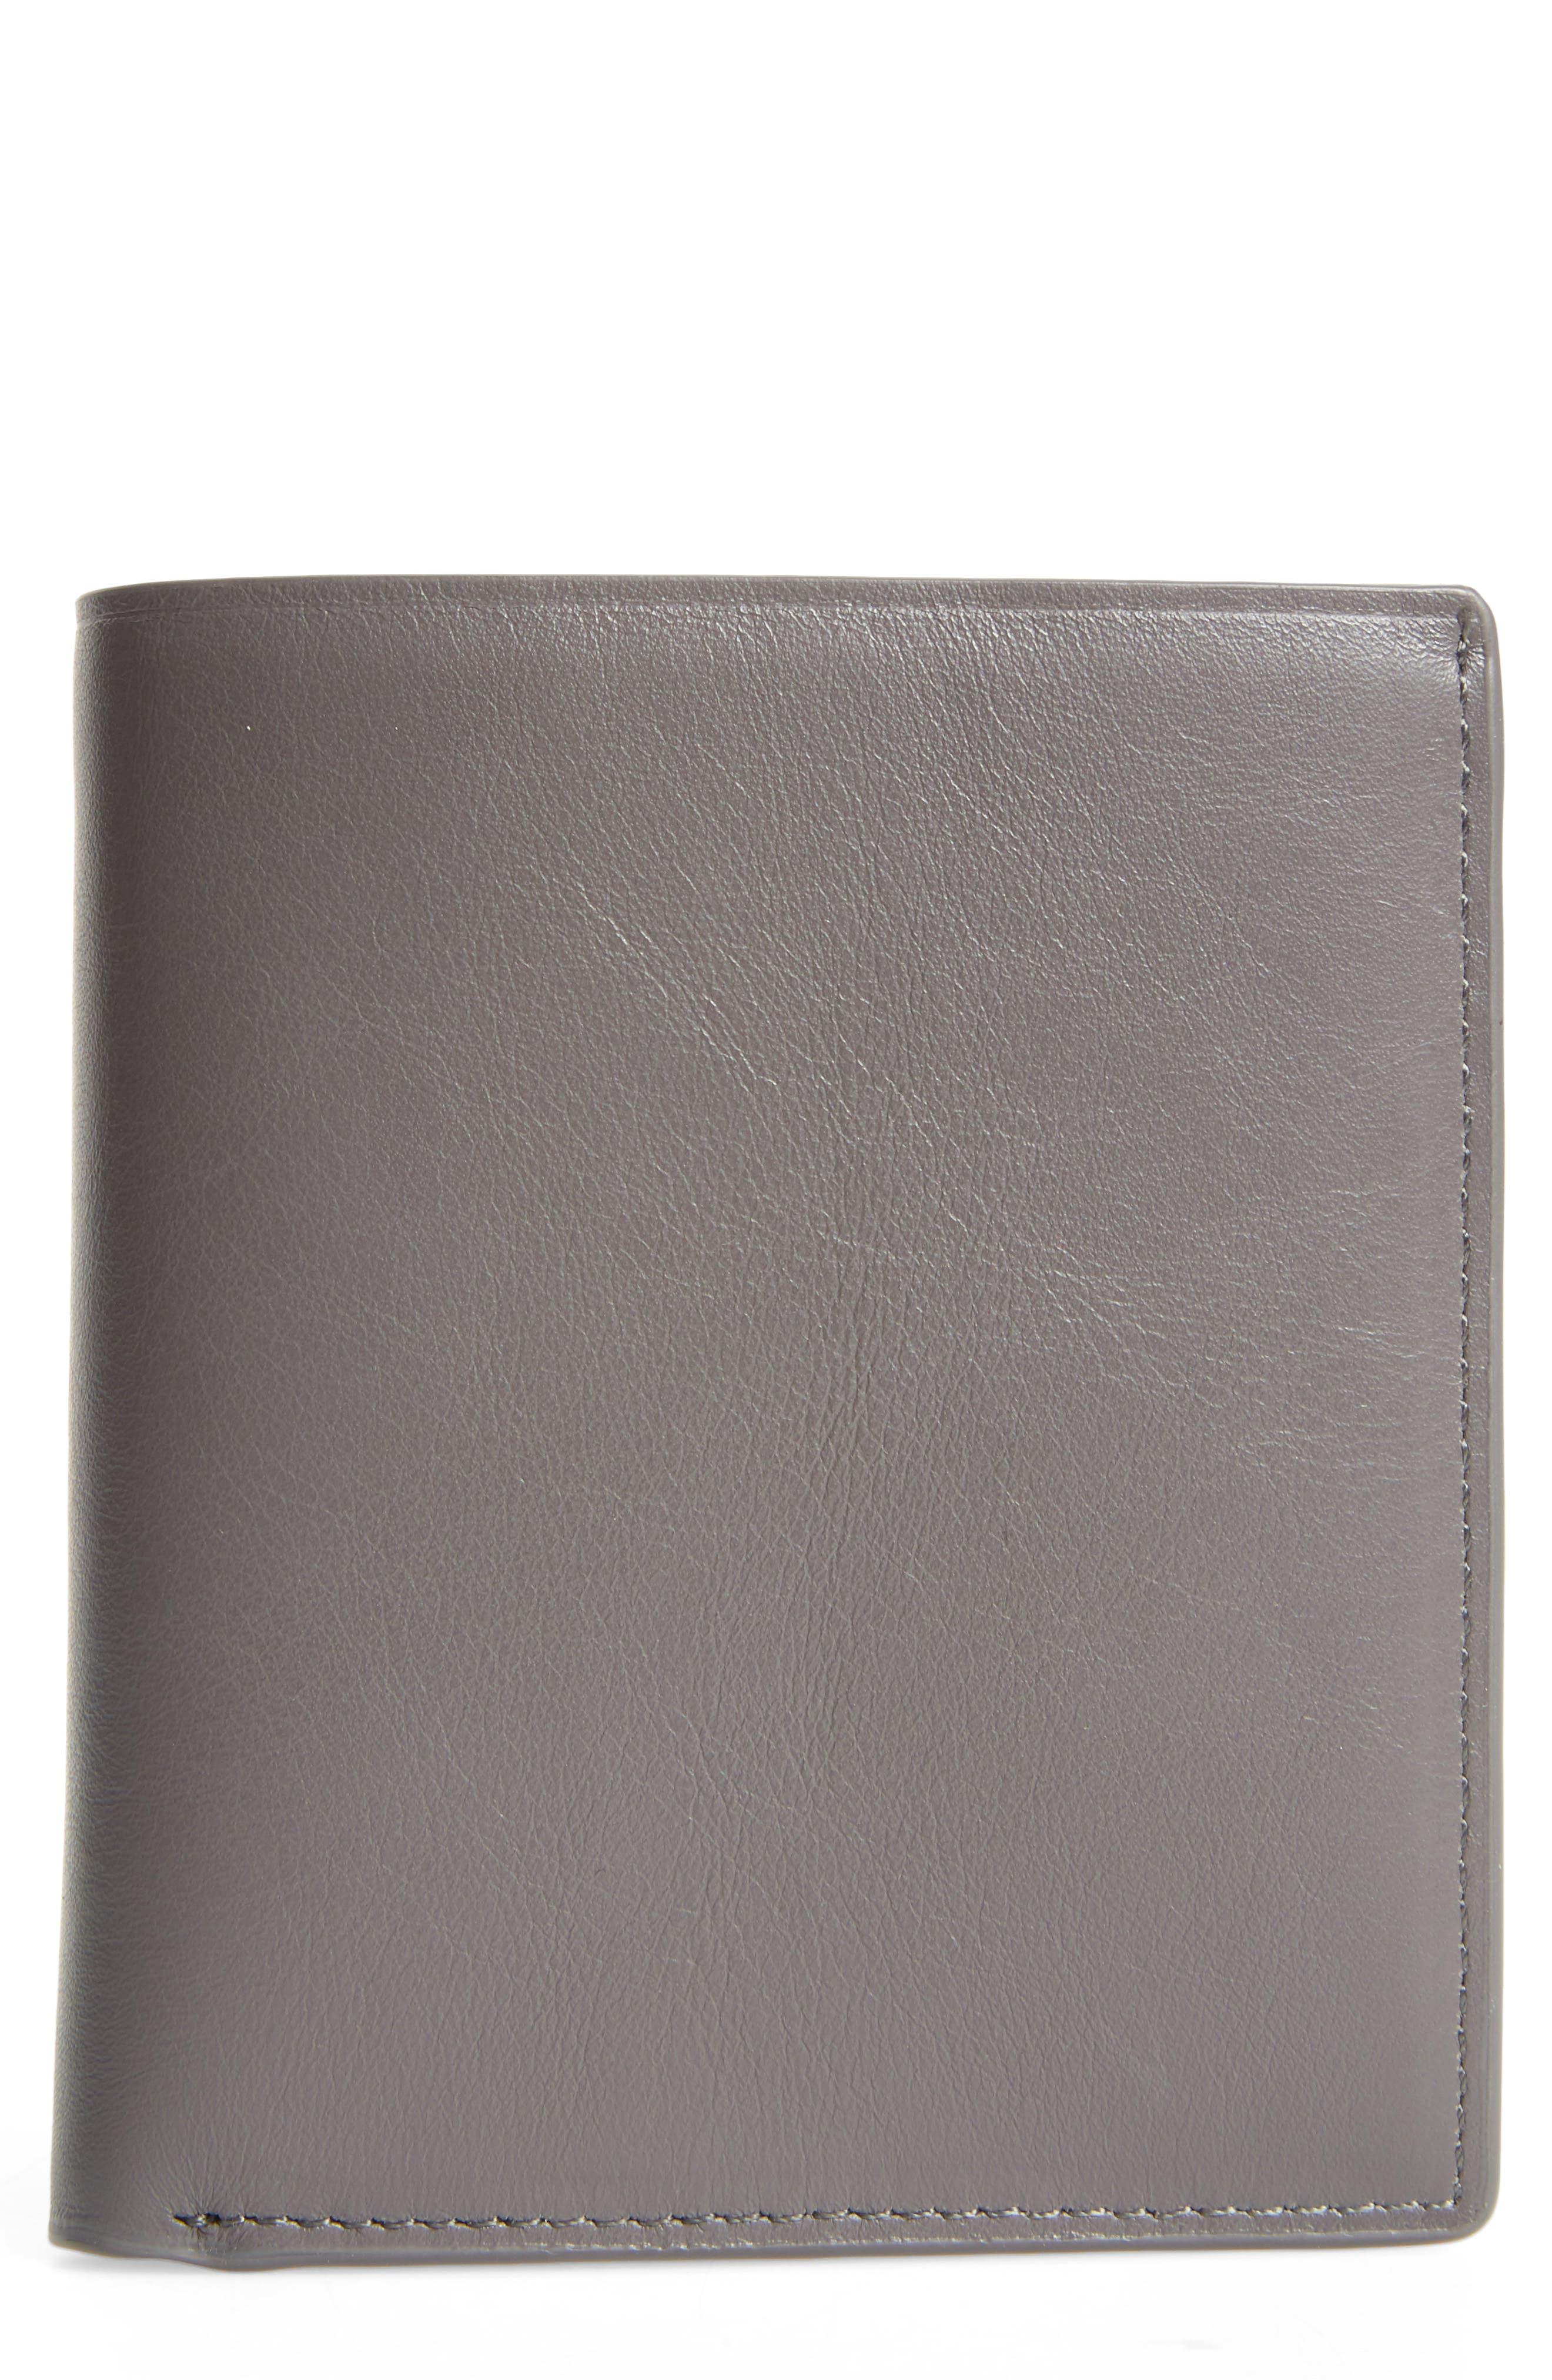 Bradley Bifold Leather Wallet,                         Main,                         color, 032